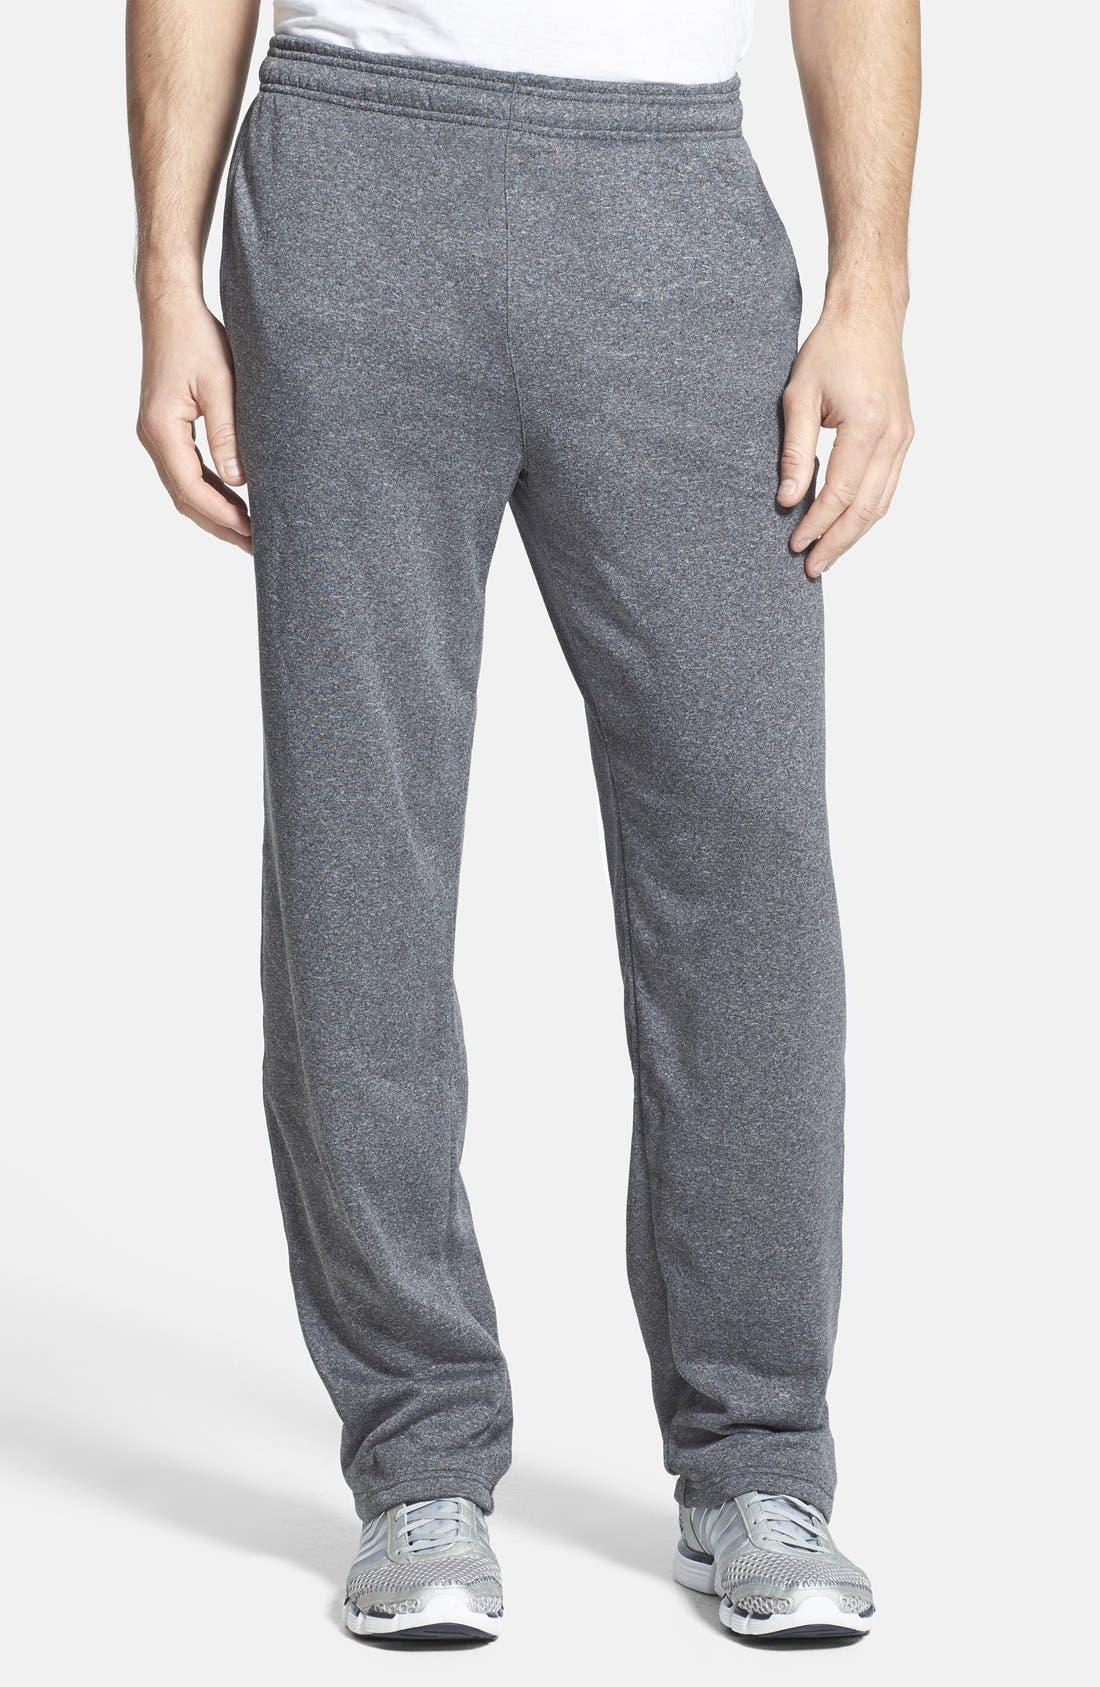 Alternate Image 1 Selected - adidas 'Ultimate' Fleece Pants